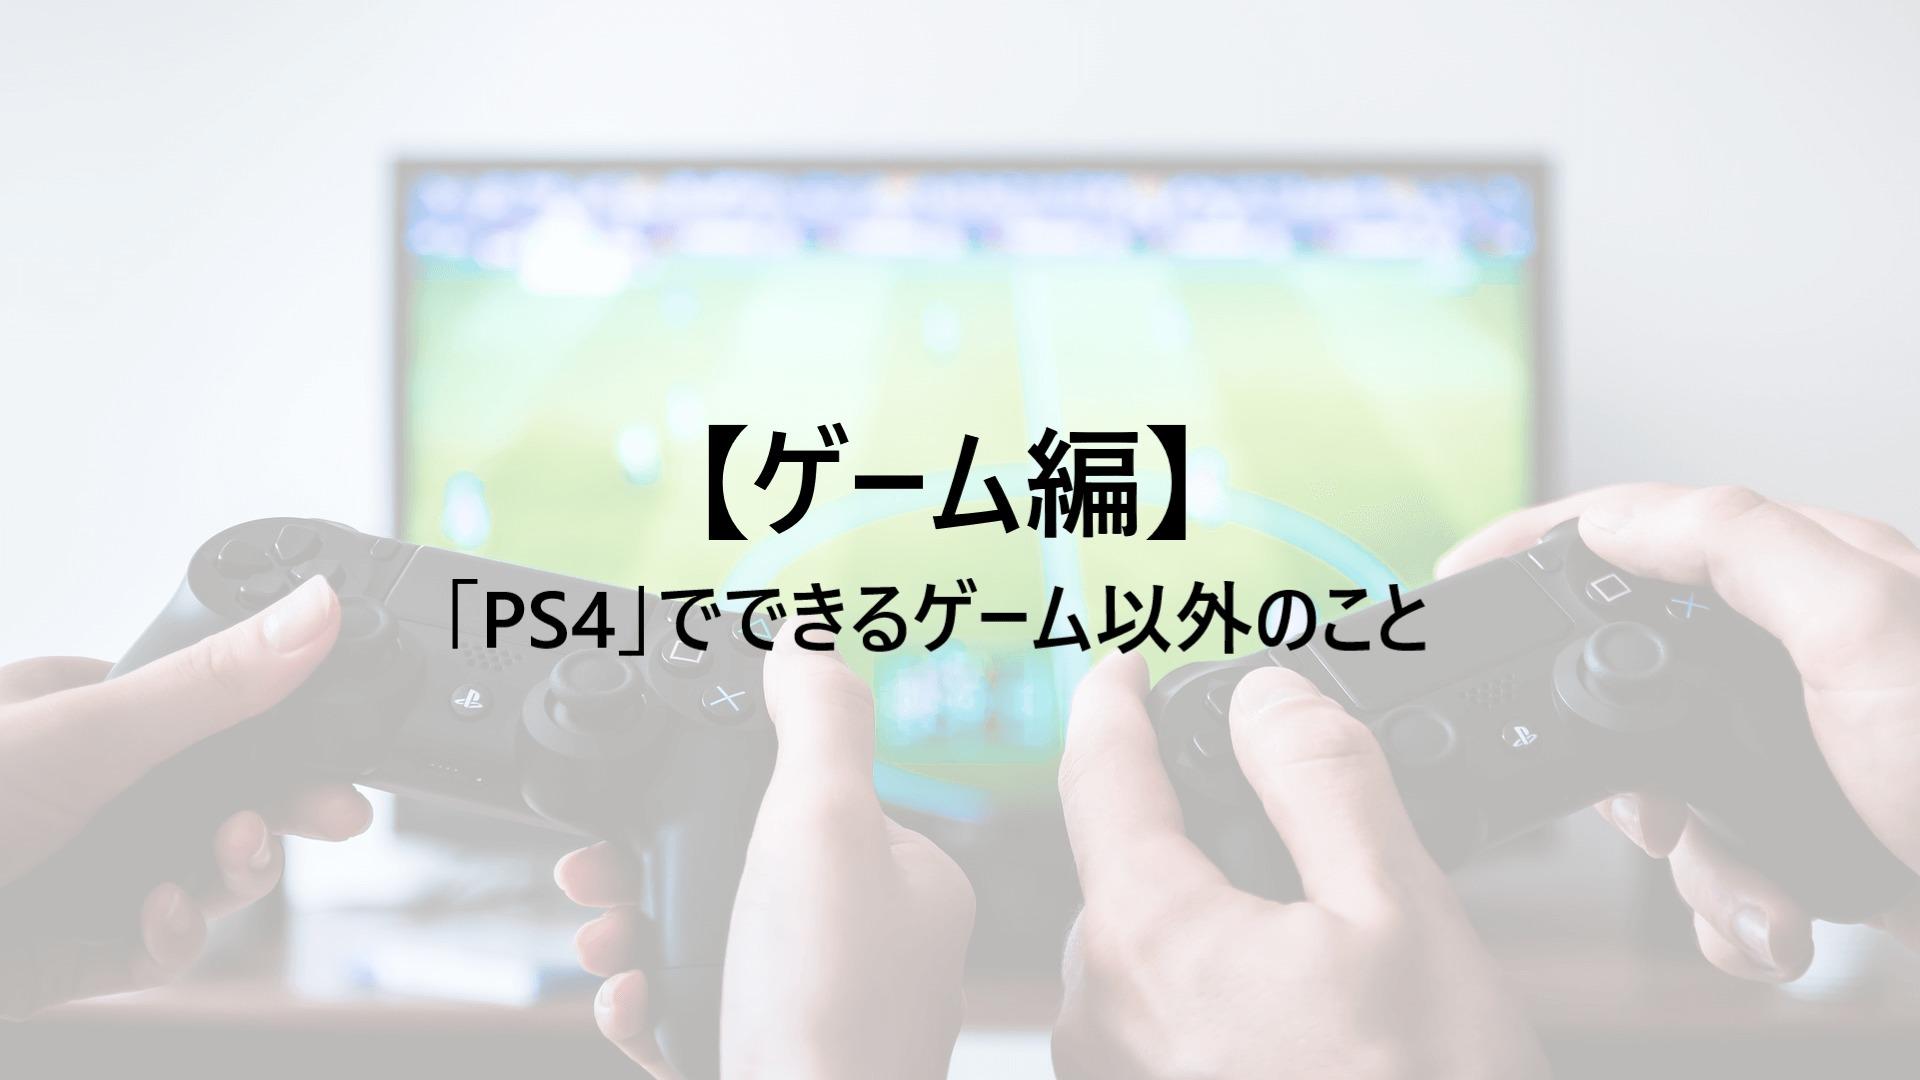 「PS4」でできるゲーム以外のこと【ゲーム編】